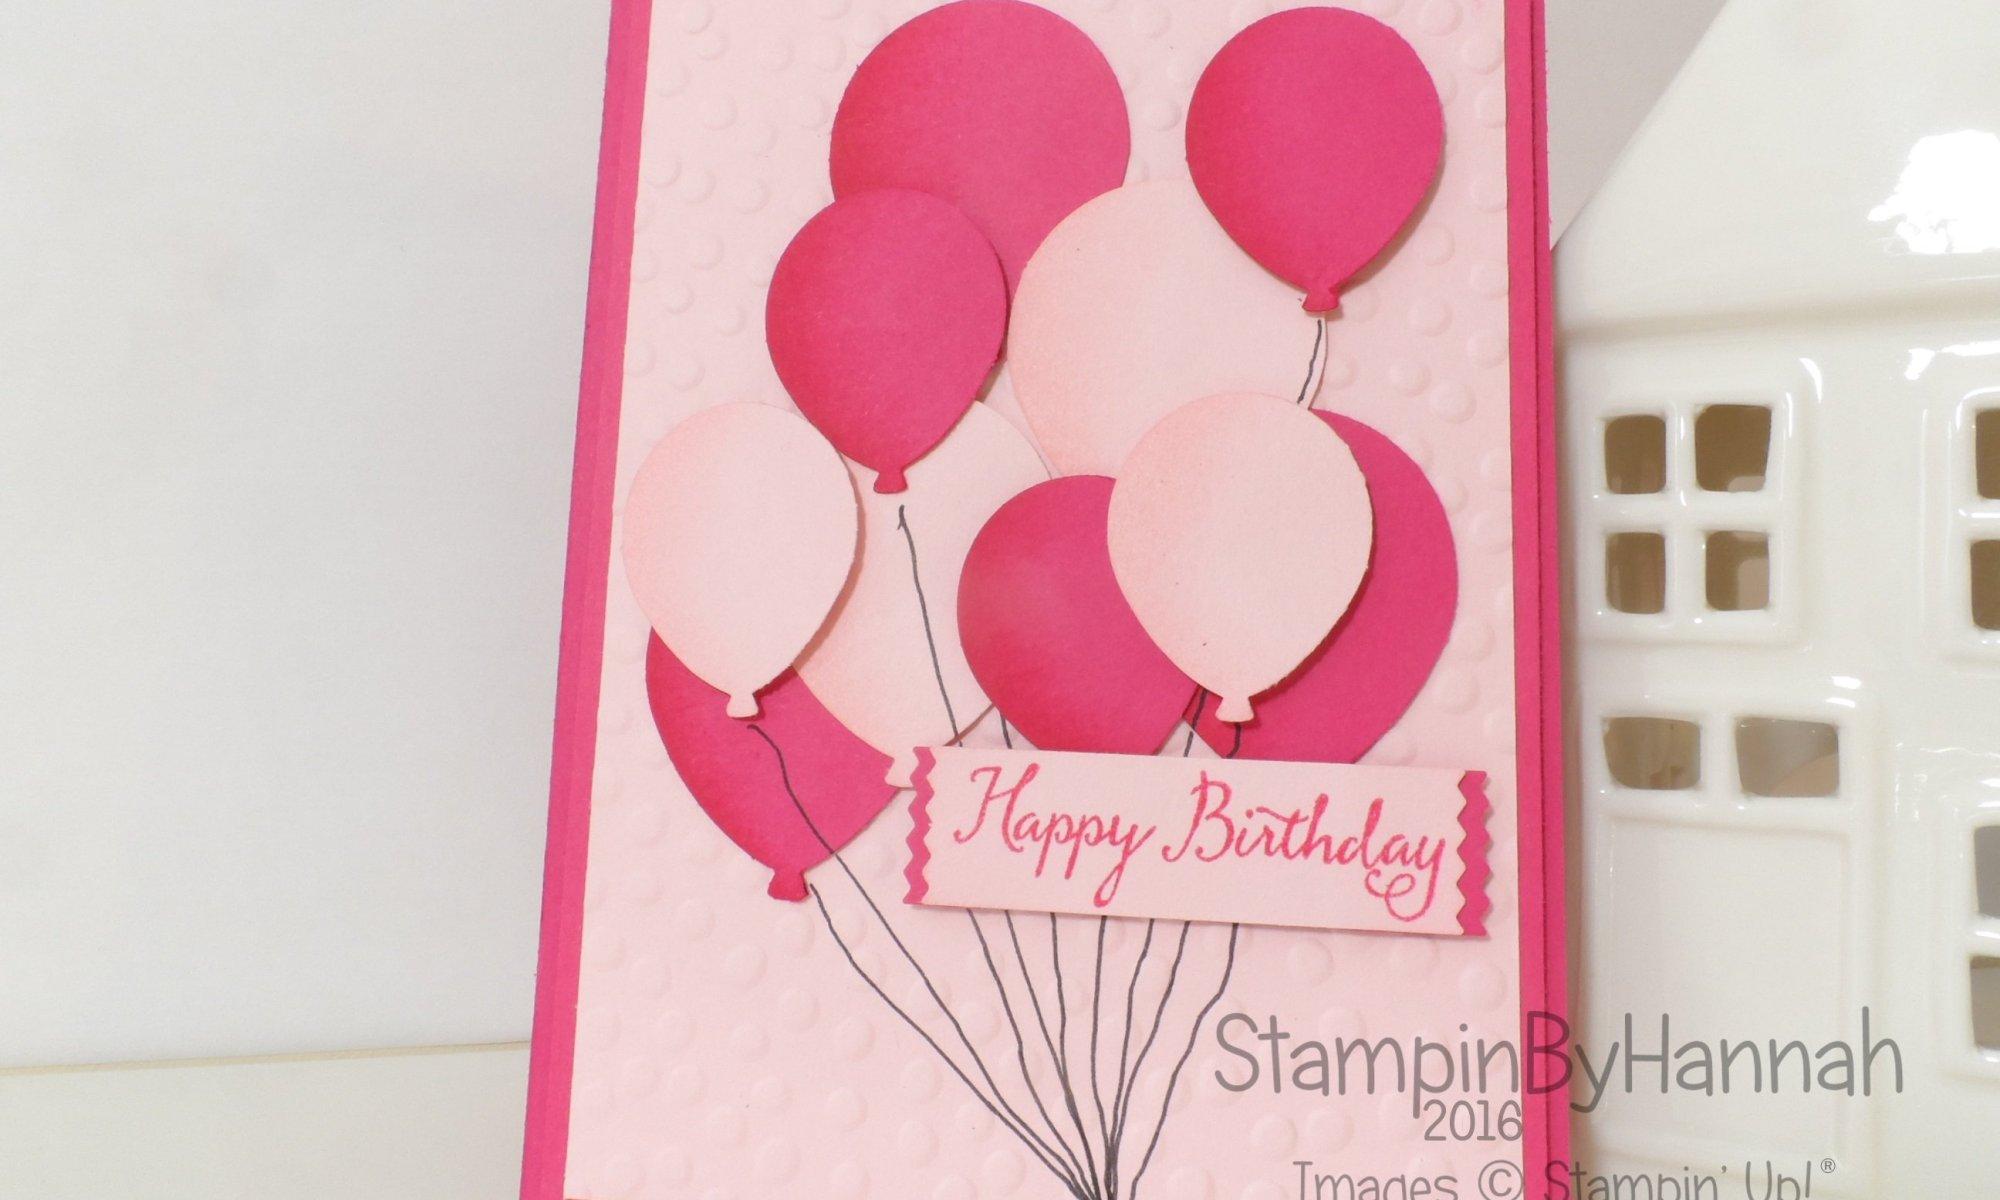 Stampin' Up! UK Balloon birthday card